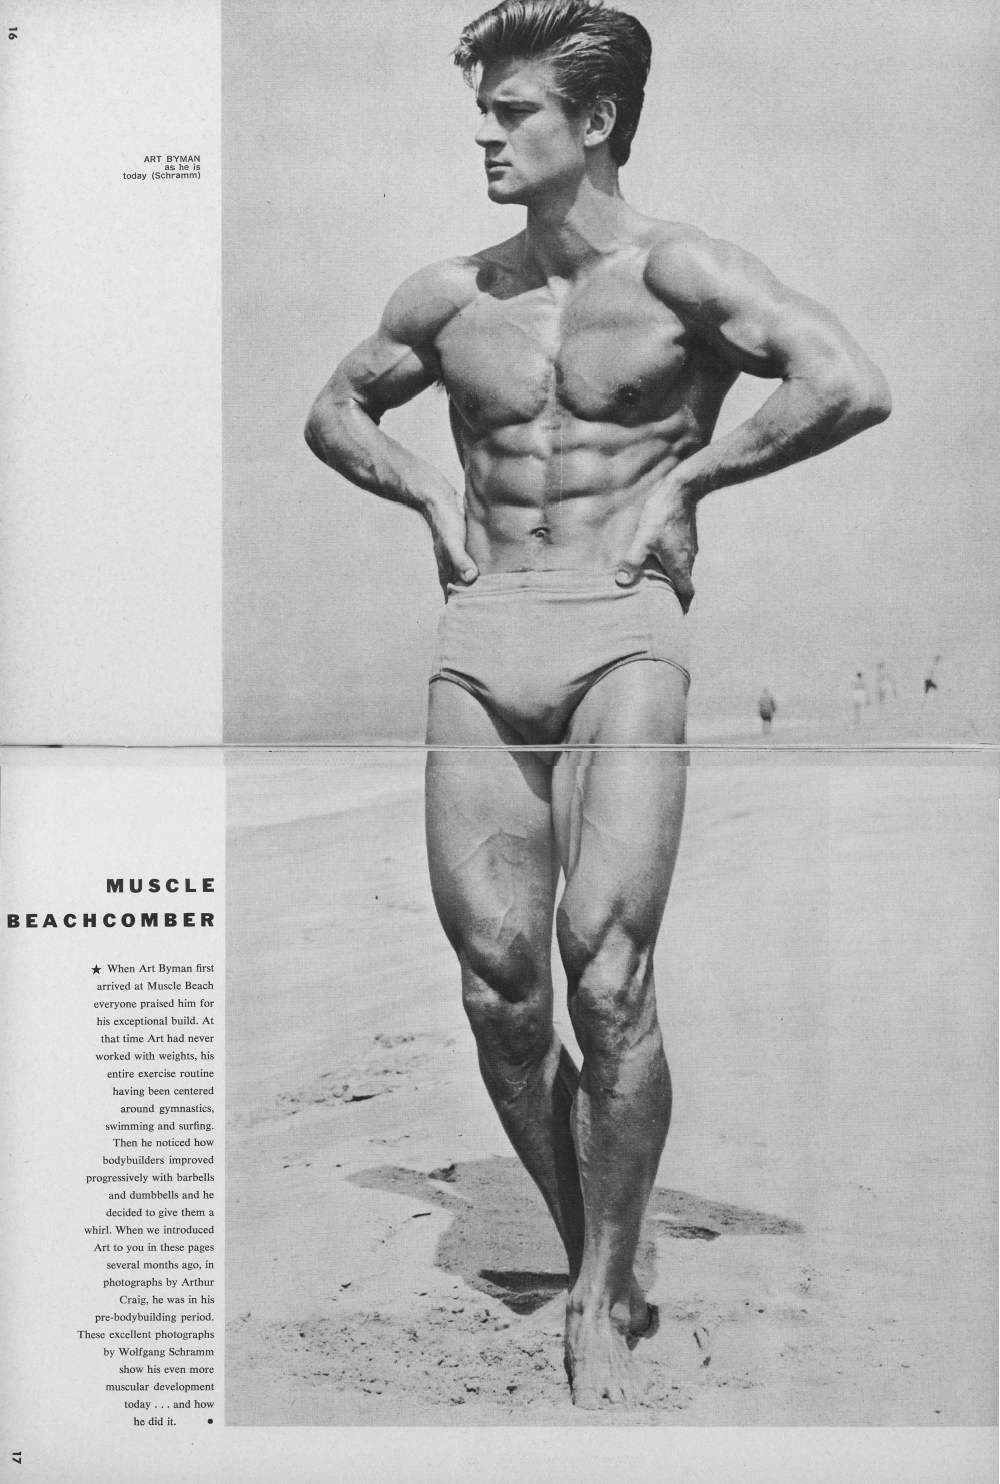 Стив ривз- фото в молодости и старости, биография бодибилдера